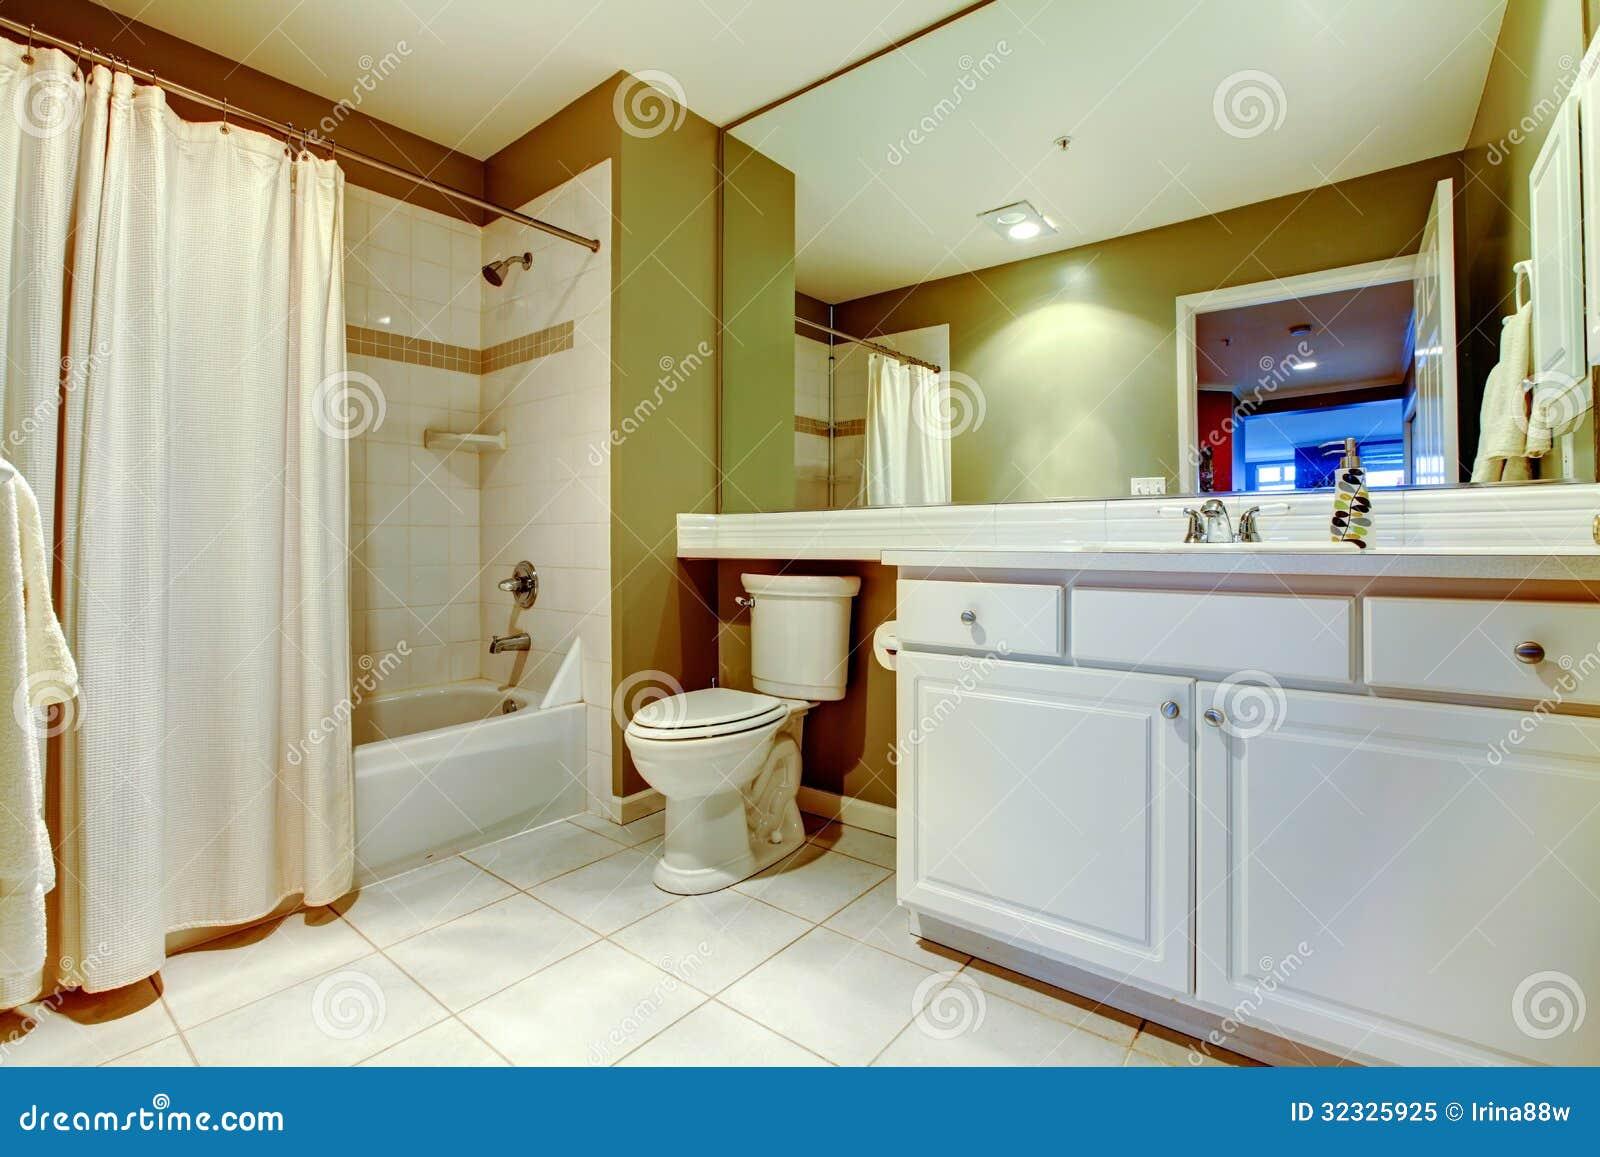 green-white-bathroom-sink-tub-curtain-tile-floor-32325925 Bathroom Sink Curtains